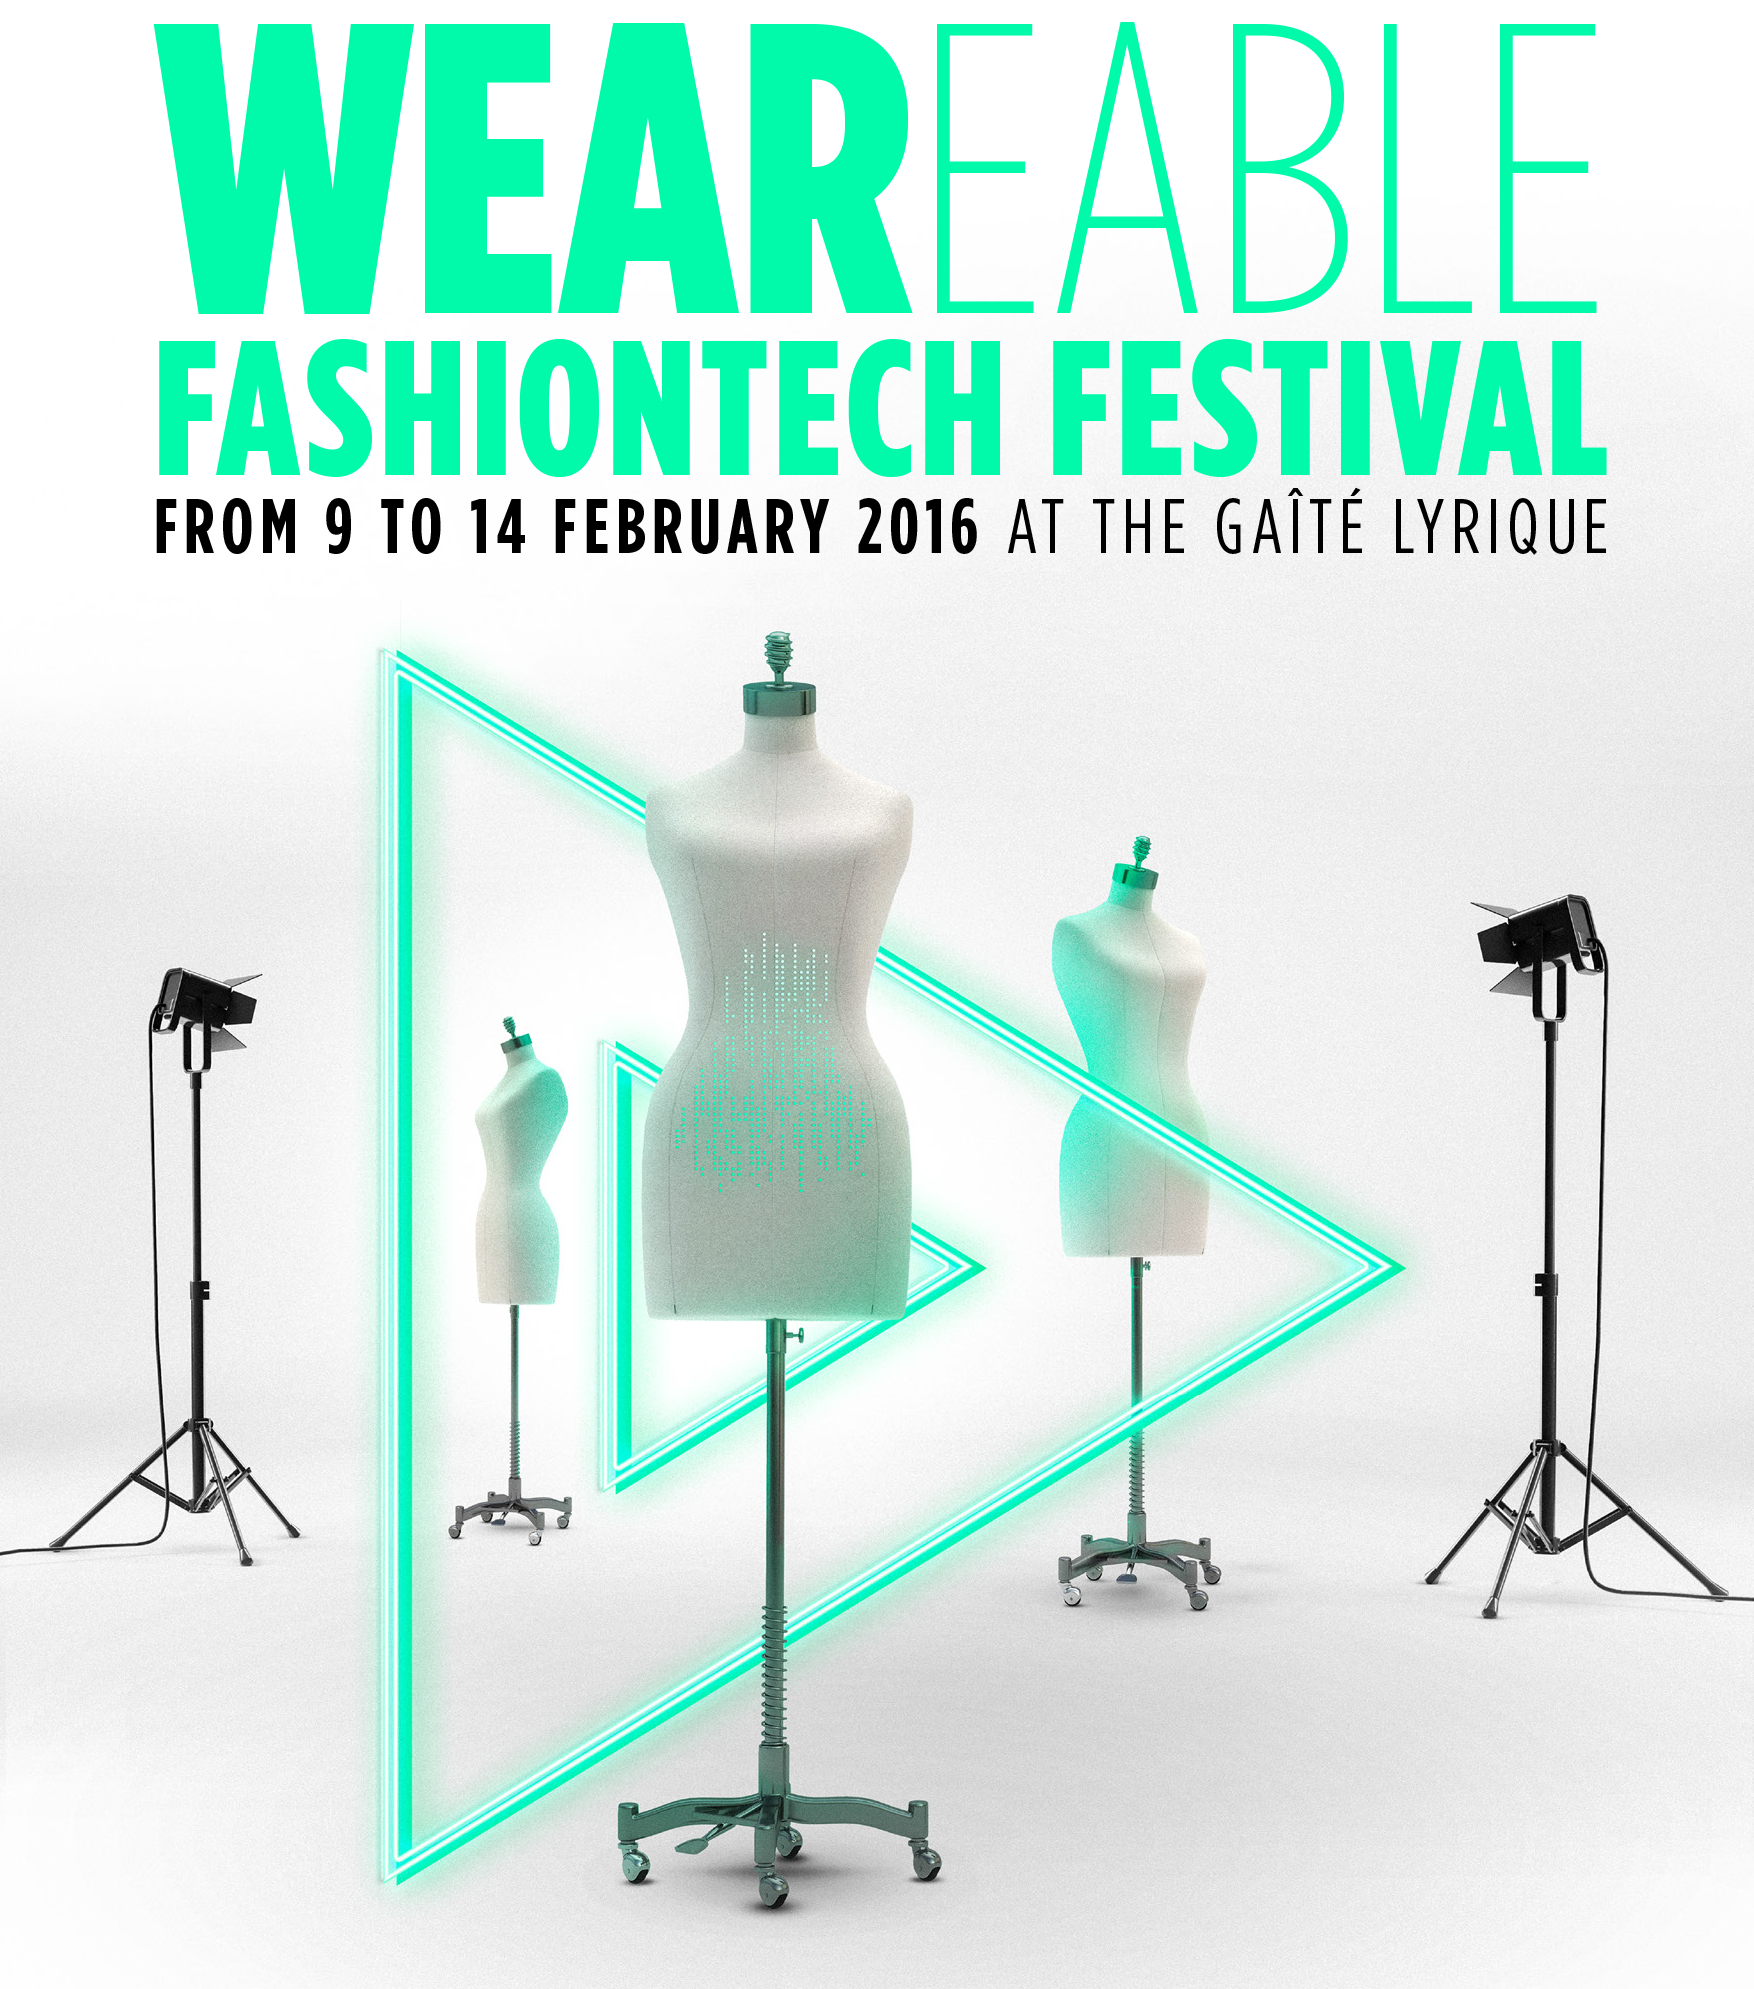 Invitation Weareable Awards-1 copy.jpg